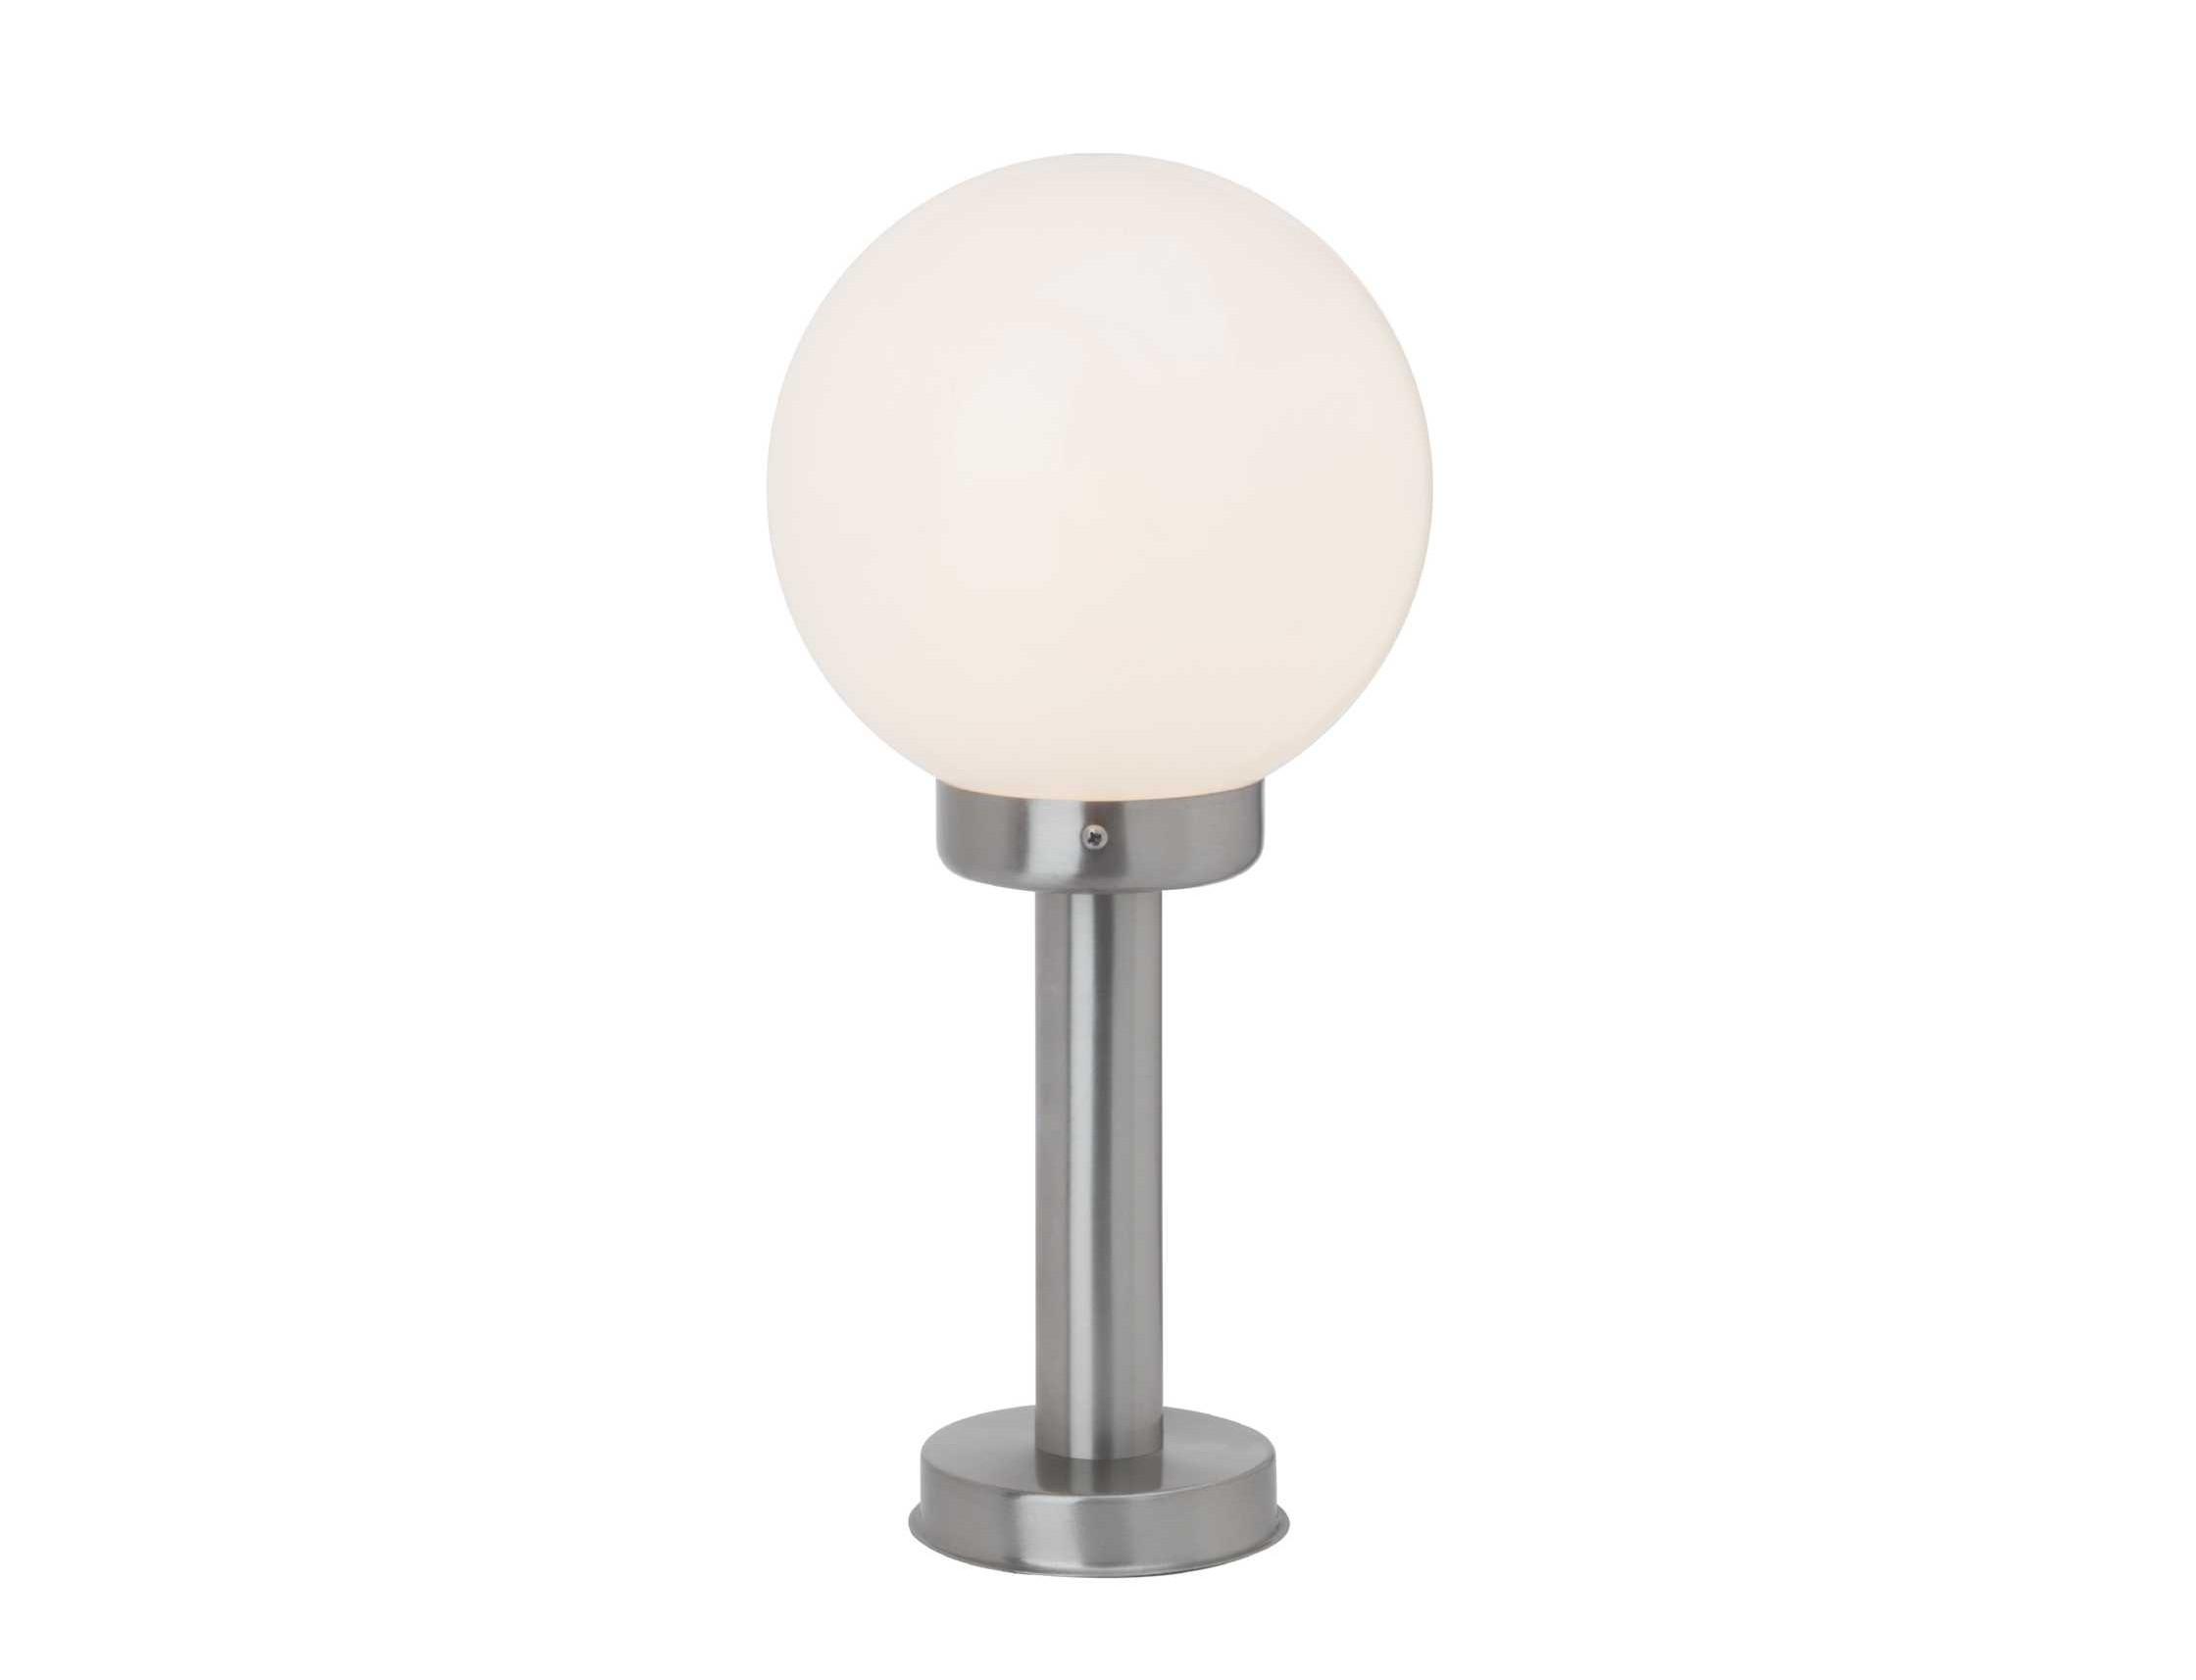 Светильник уличный MadisonУличные наземные светильники<br>Вид цоколя: E27&amp;nbsp;Мощность ламп: 60WКоличество ламп: 1&amp;nbsp;Наличие ламп: отсутствуют<br><br>kit: None<br>gender: None